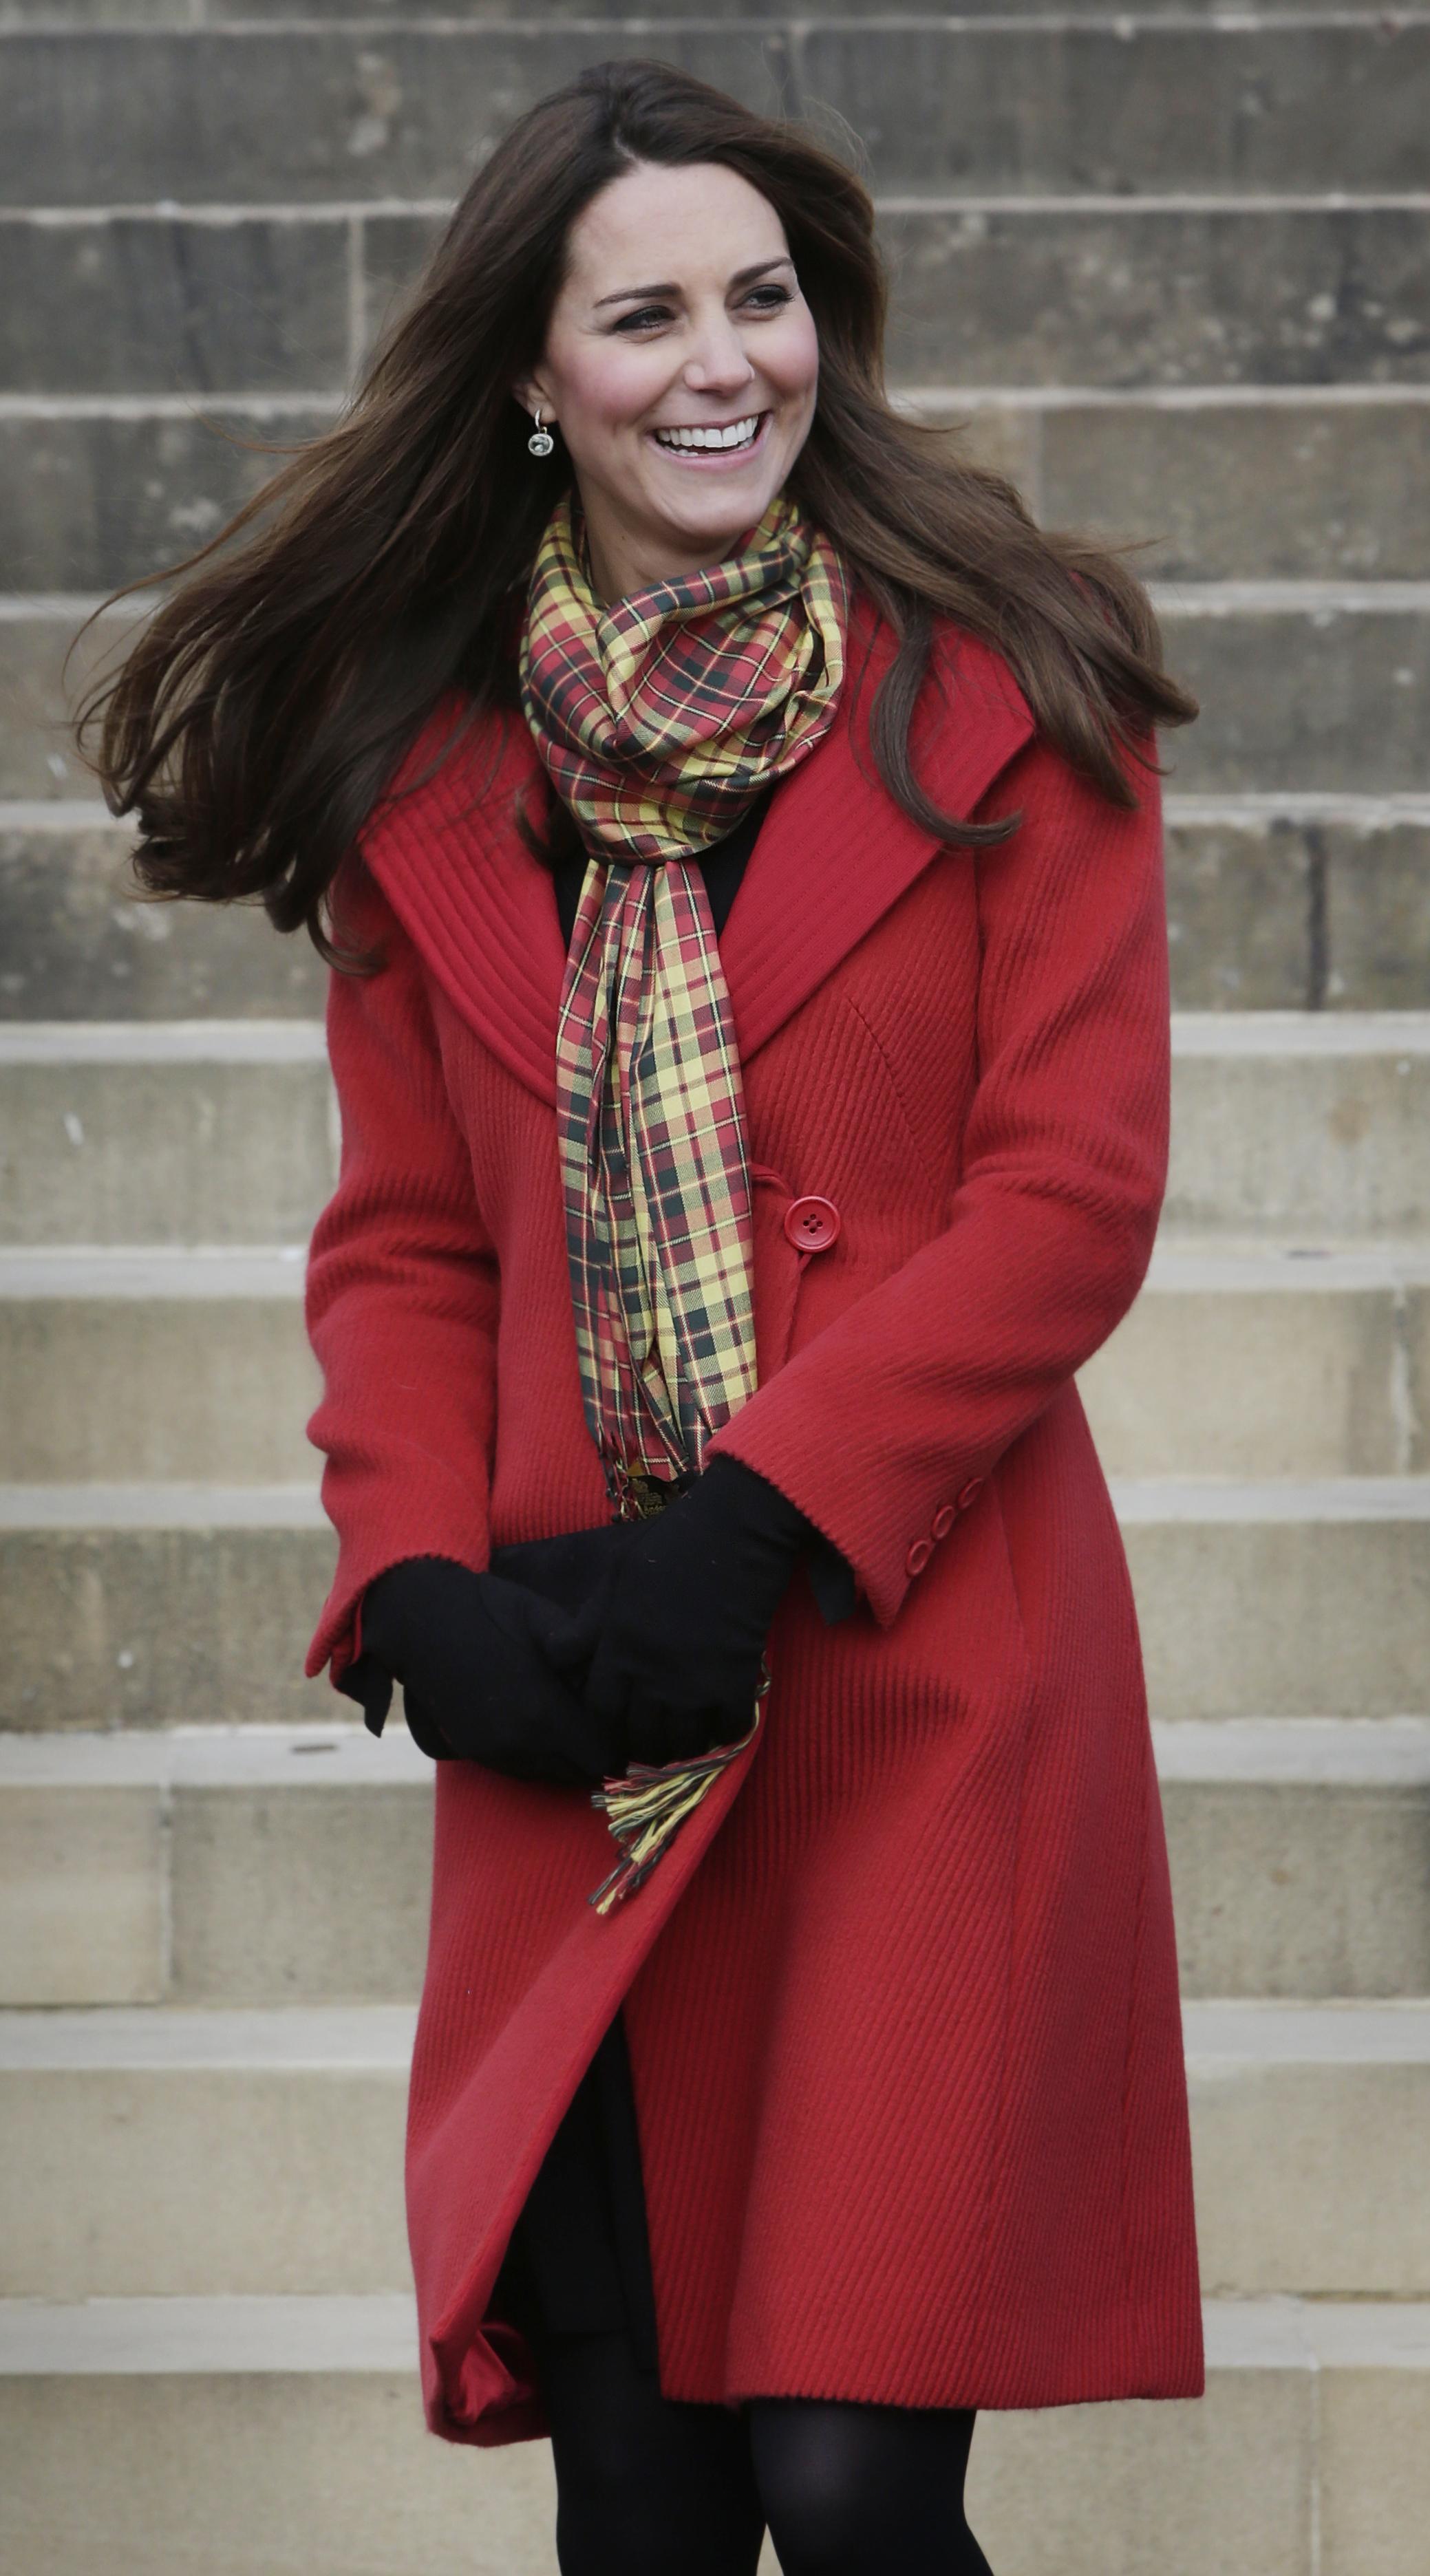 Duchess Kate smiling